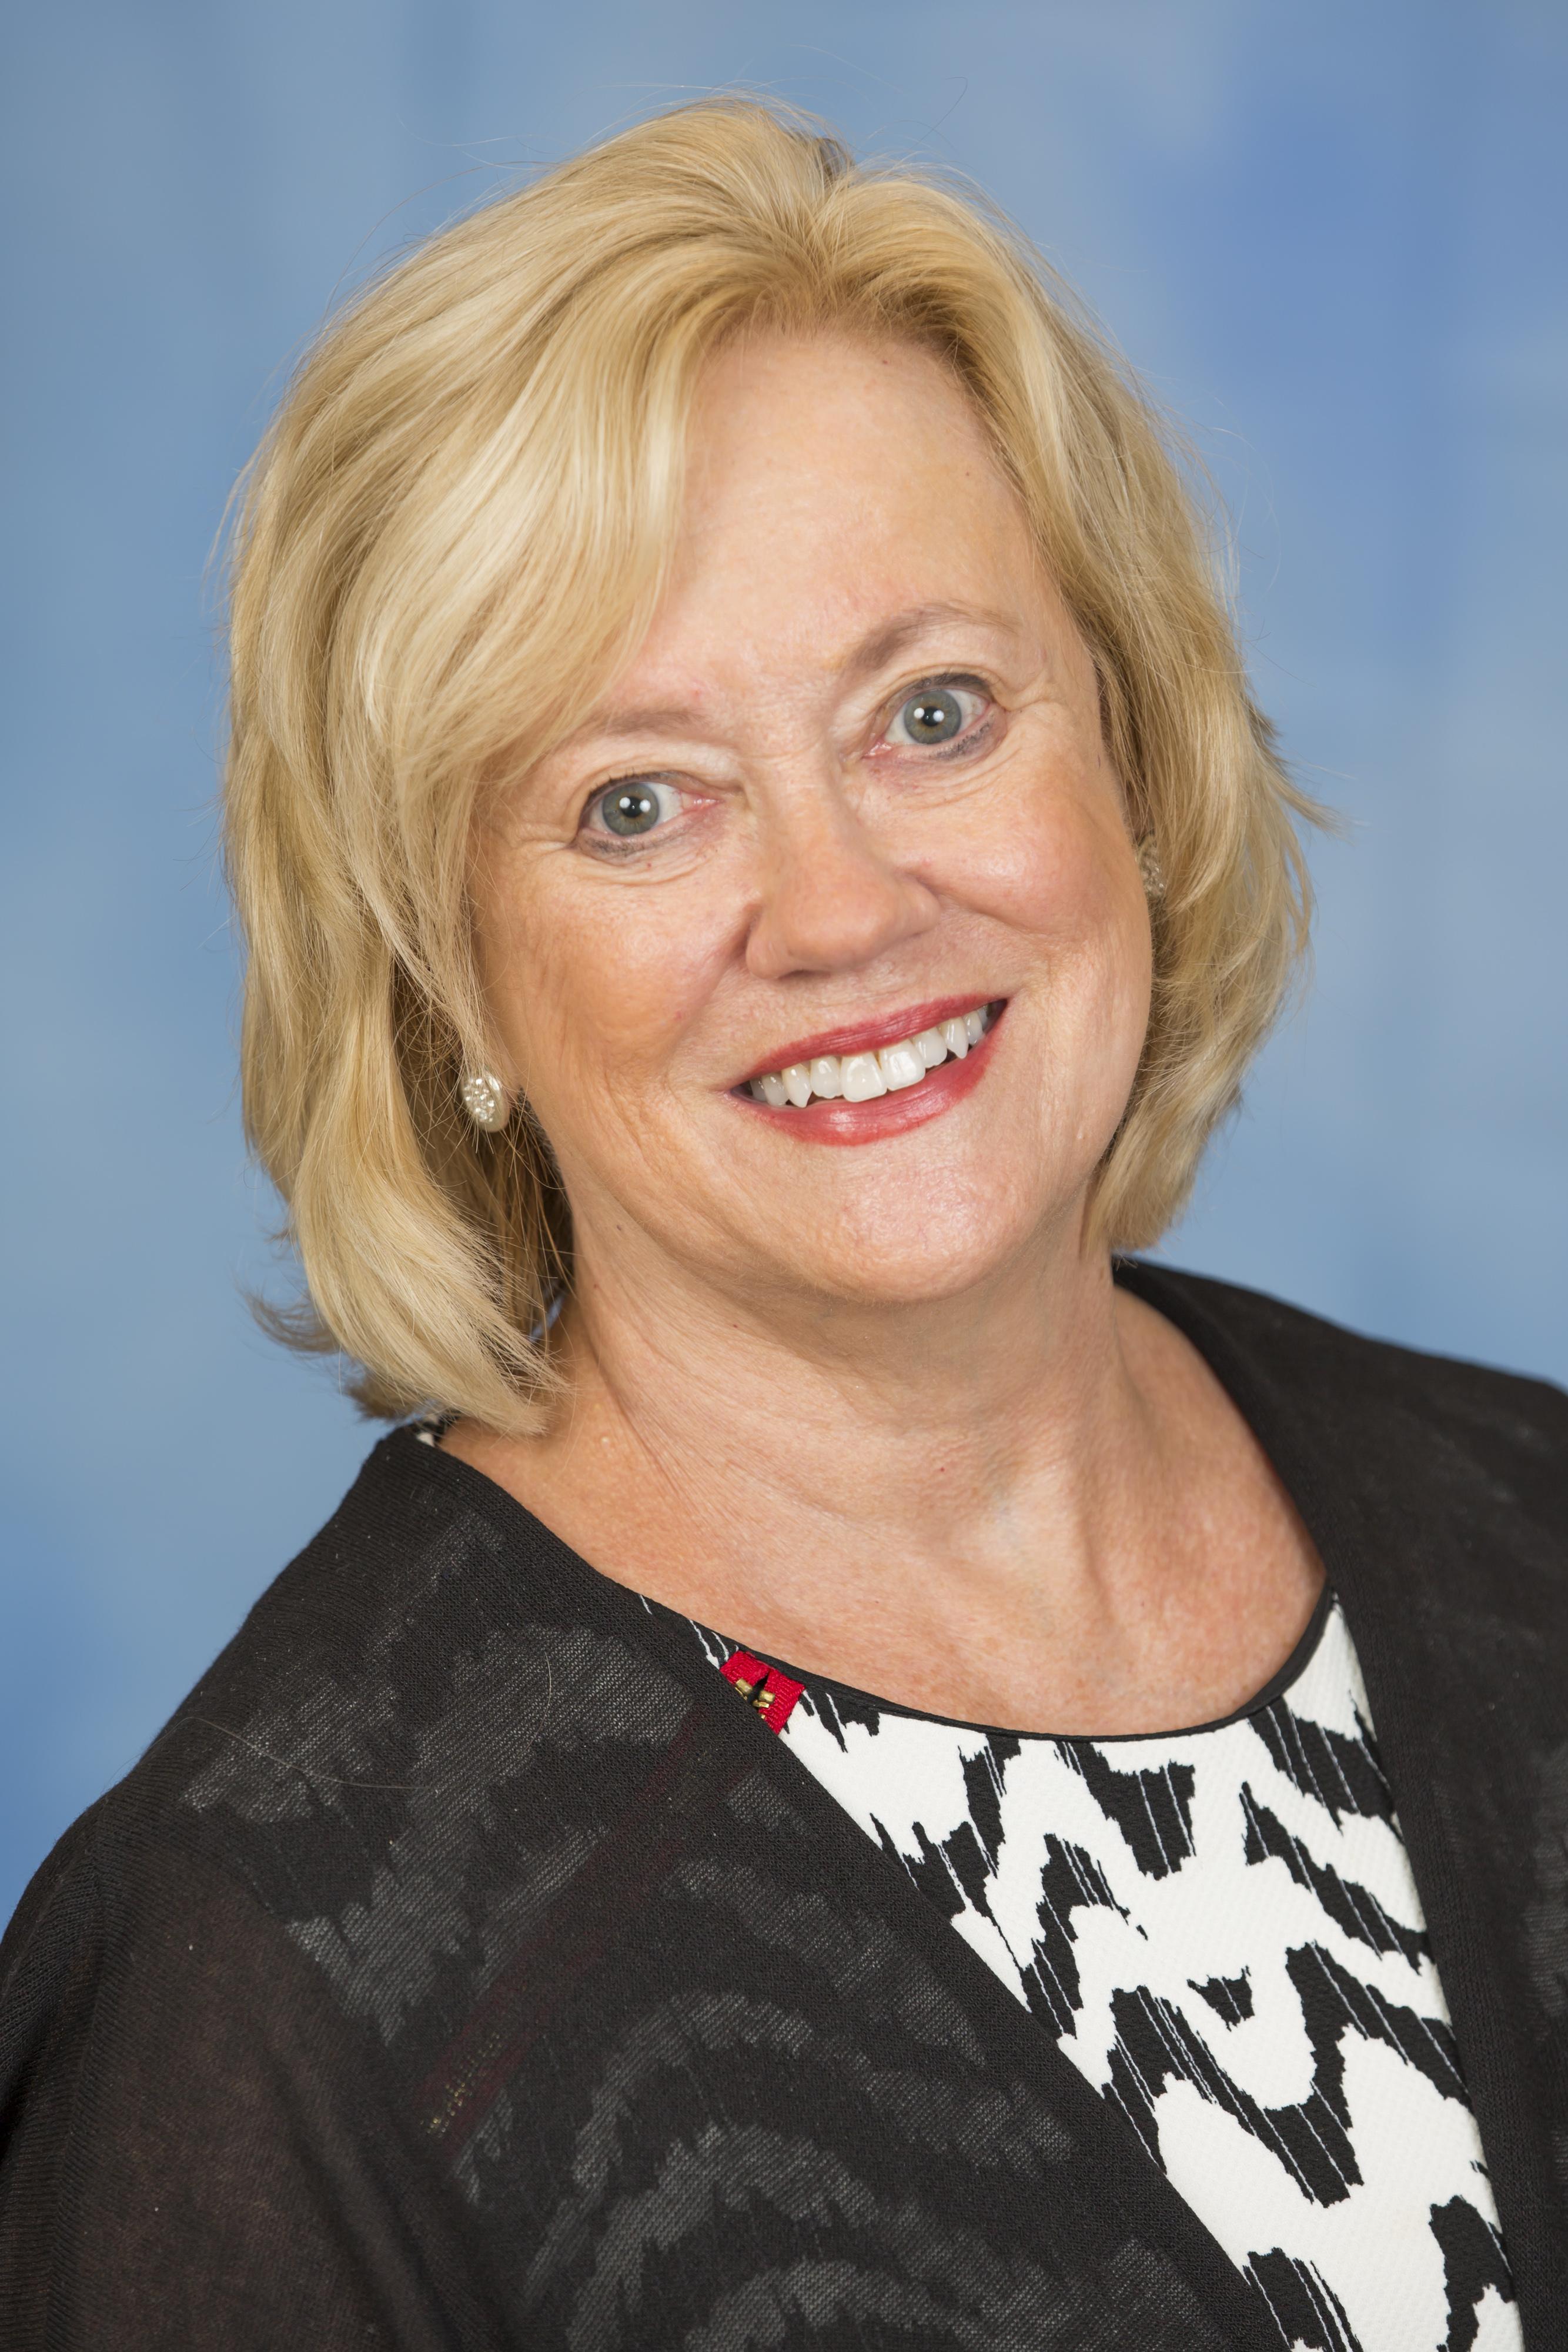 Cheryl McGinnis